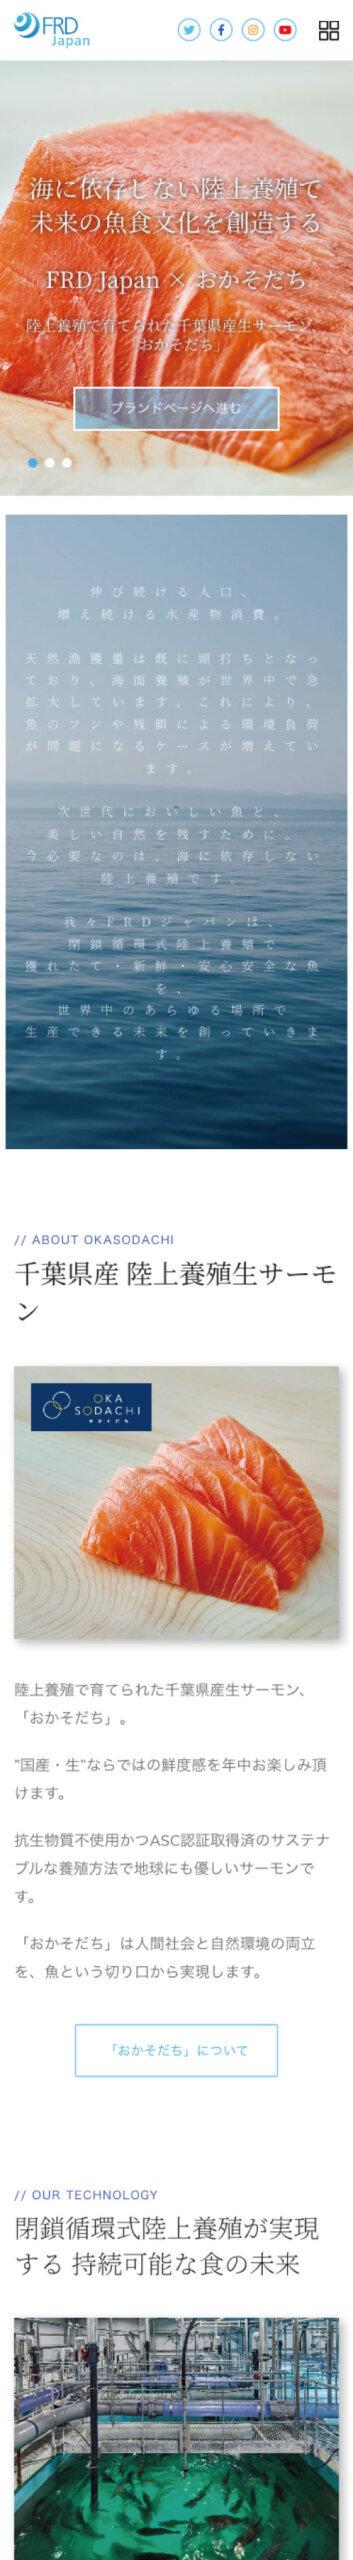 FRDジャパン様ウェブサイト、スマホ版